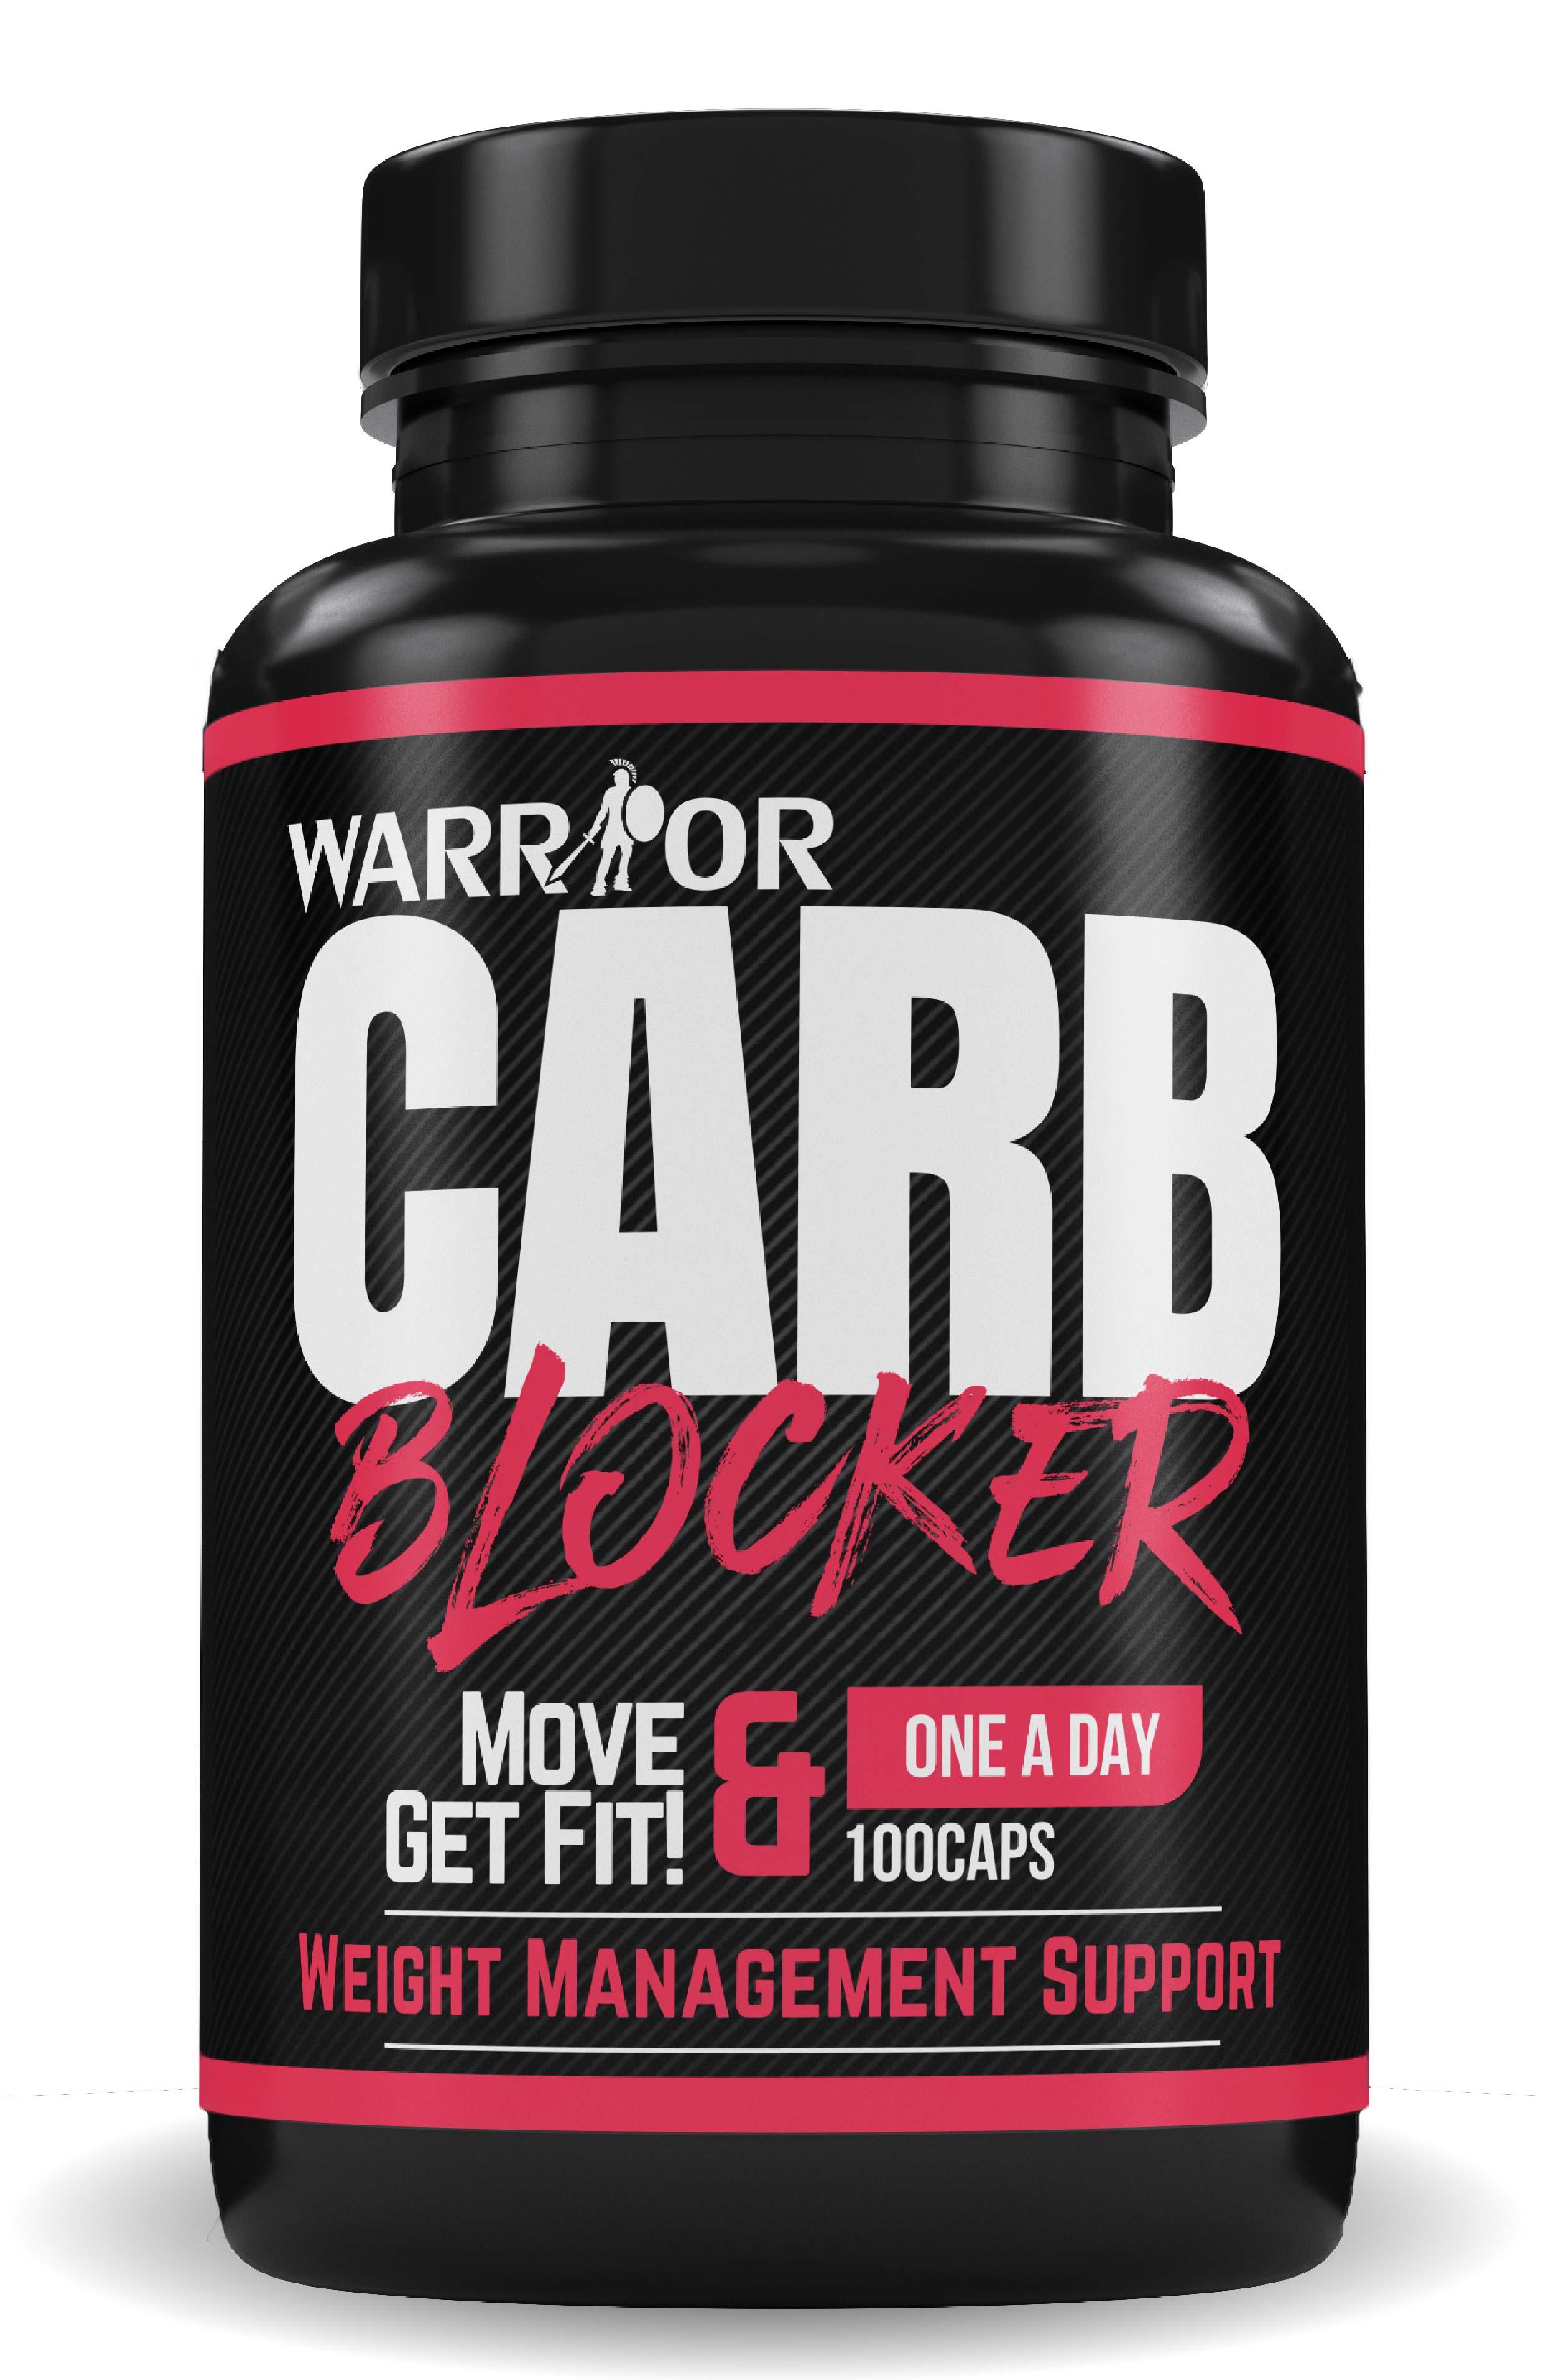 Carb Blocker Weight Loss 100 caps